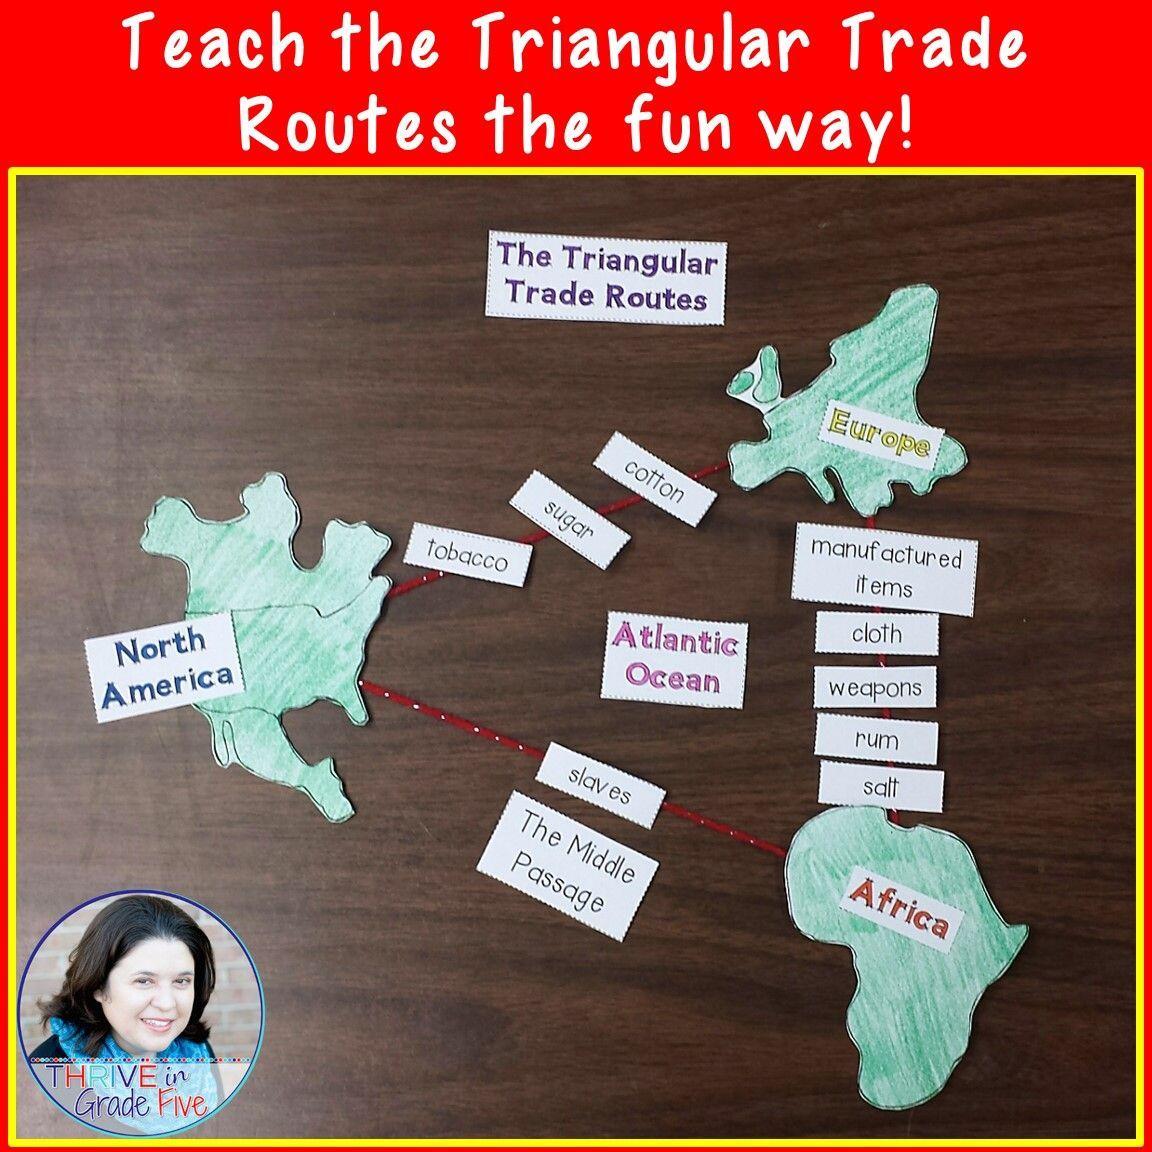 Triangular Trade Routes Activity Social Studies Middle School Social Studies Education Social Studies Lesson